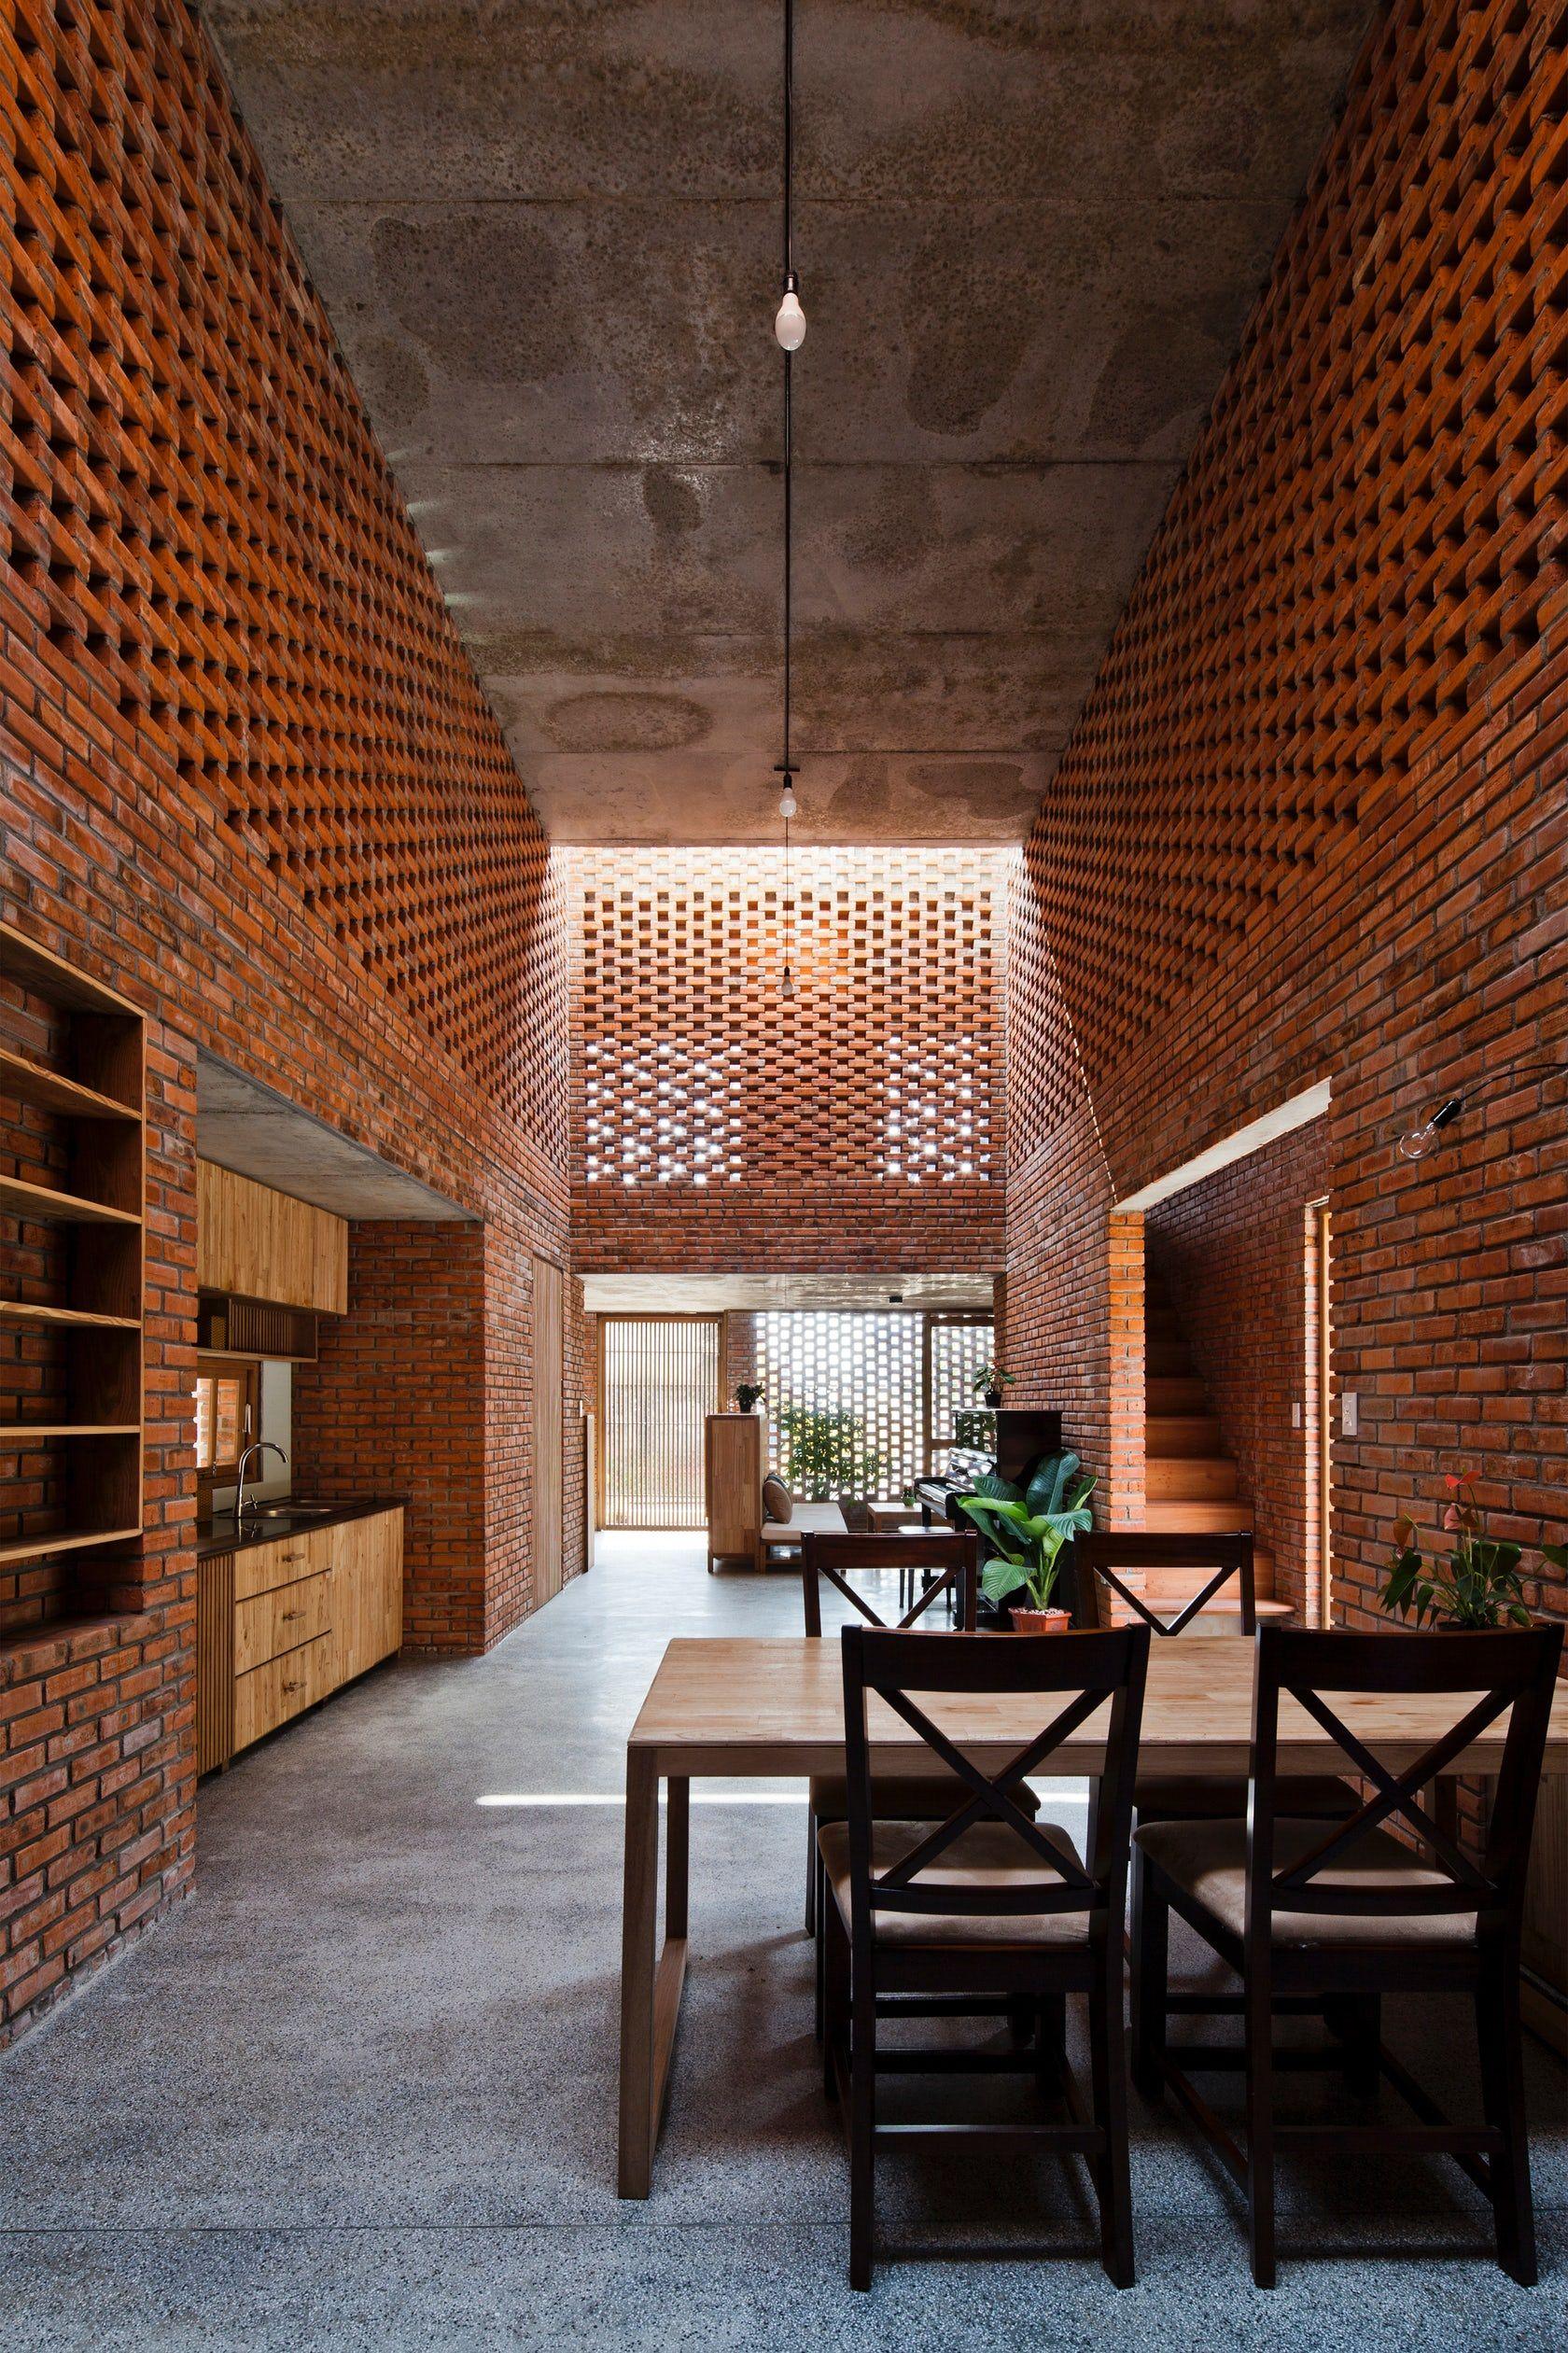 99 Modern Brick Home And Schoolhouse Design Brings Innovative